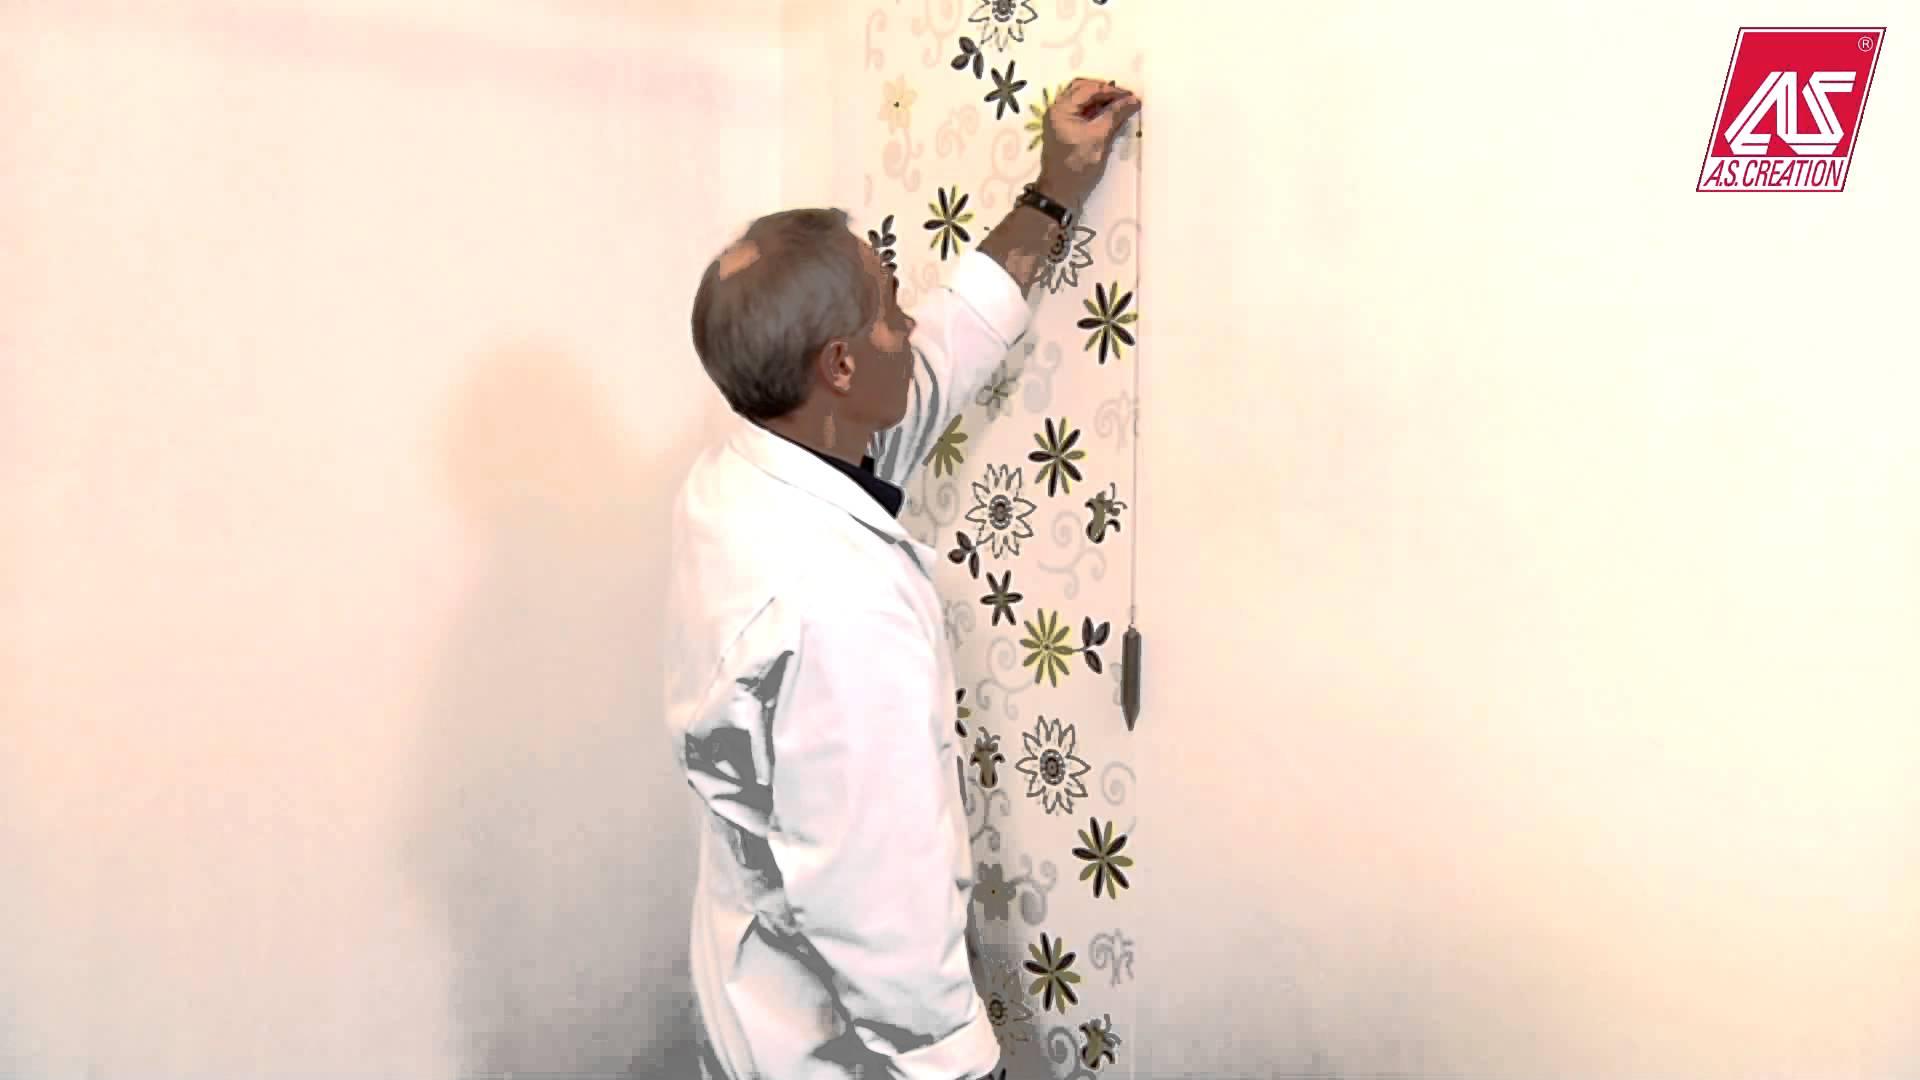 Download Tools For Hanging Wallpaper Plumb Line 1313 1920x1080